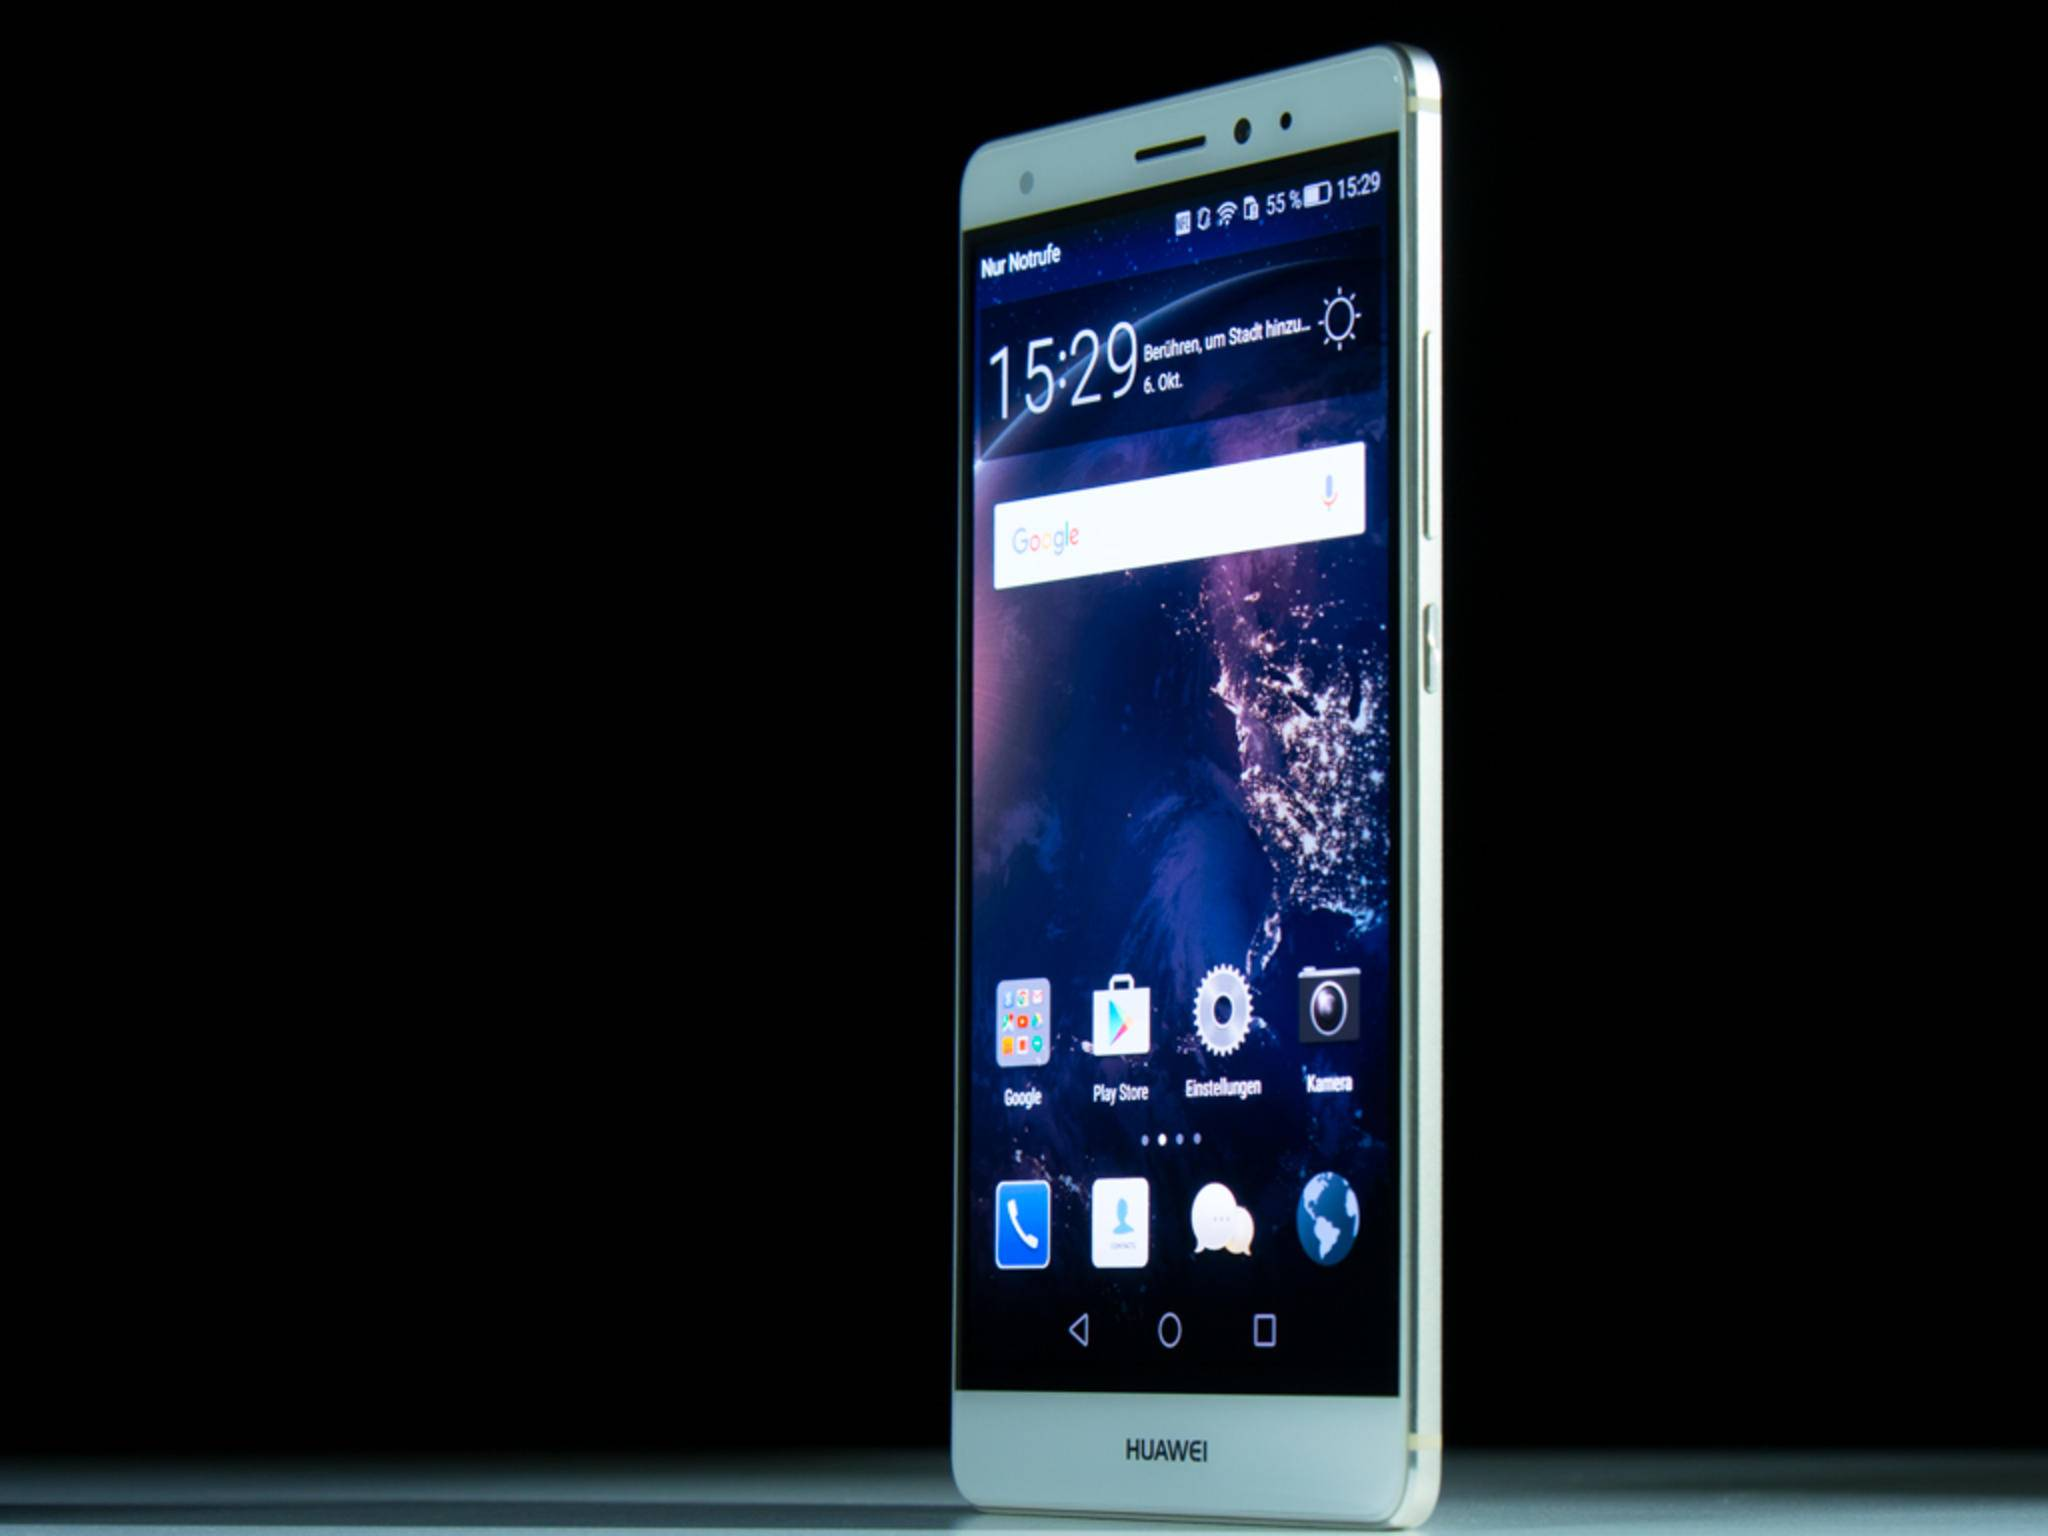 Das Huawei Mate S bekommt ein Marshmallow-Update.